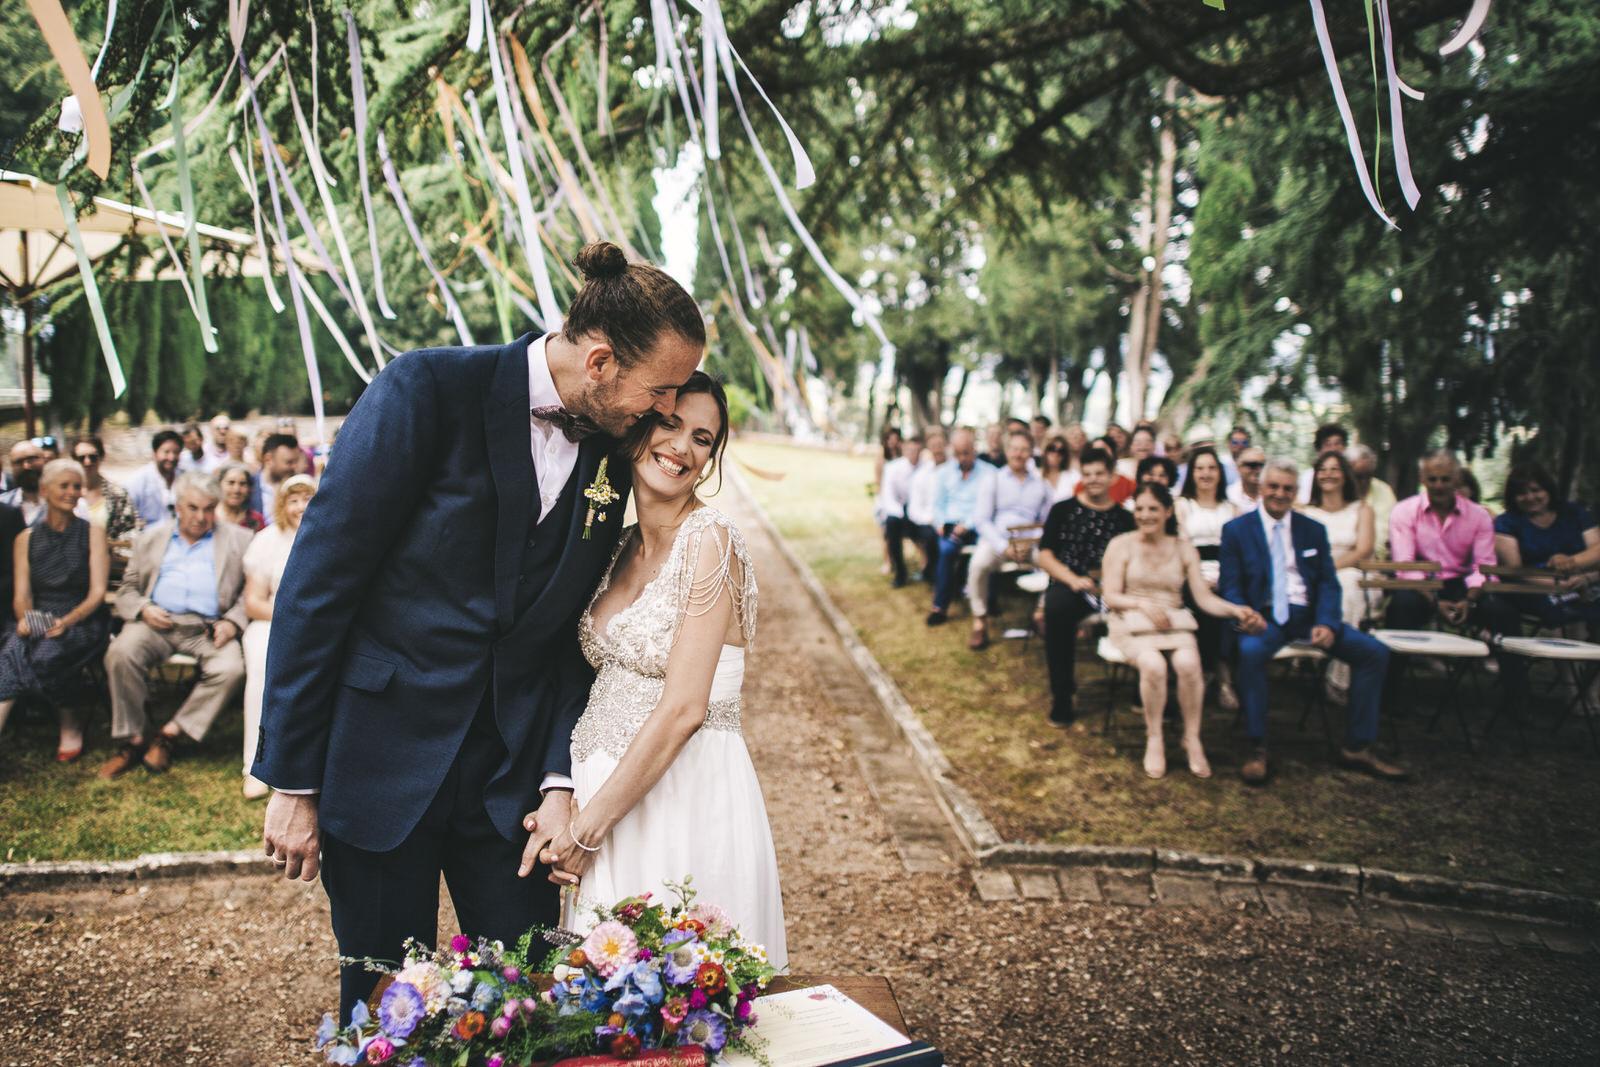 wedding photographer in italy-venice-tuscany-florence-amalfi coast-como lake-villa del balbianello-siena-amalfi-ravello-belmond-villa cimbrone20